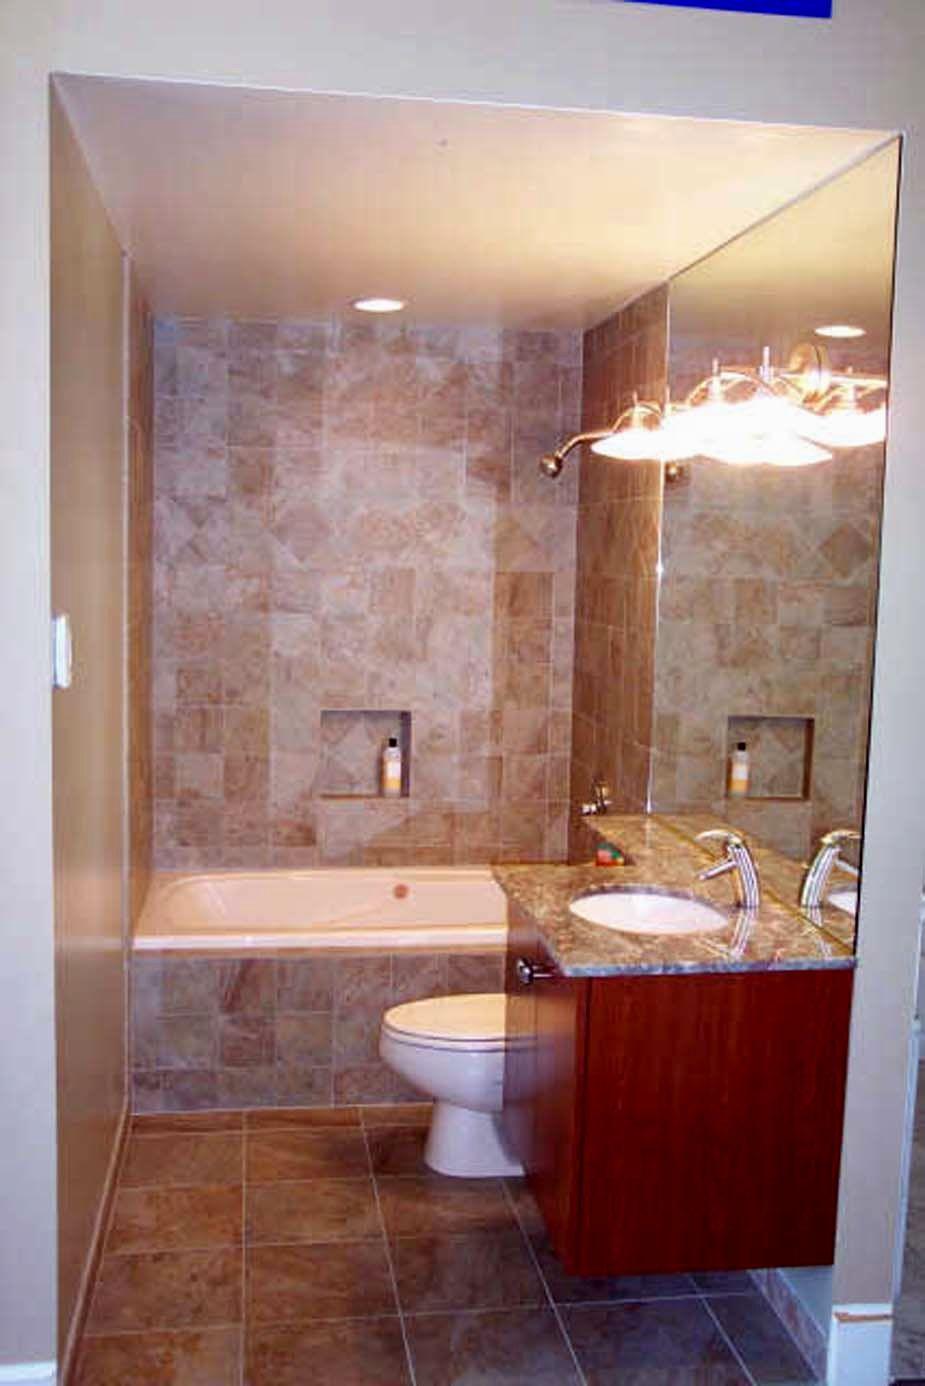 elegant cost to redo a bathroom image-Sensational Cost to Redo A Bathroom Layout